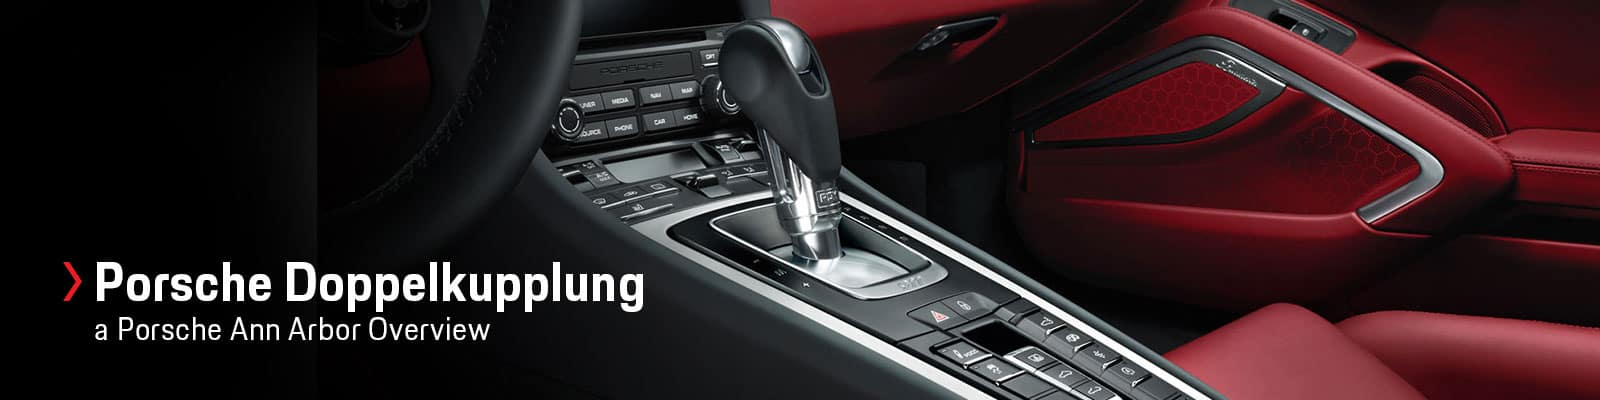 Porsche Doppelkupplung (PDK) Transmission